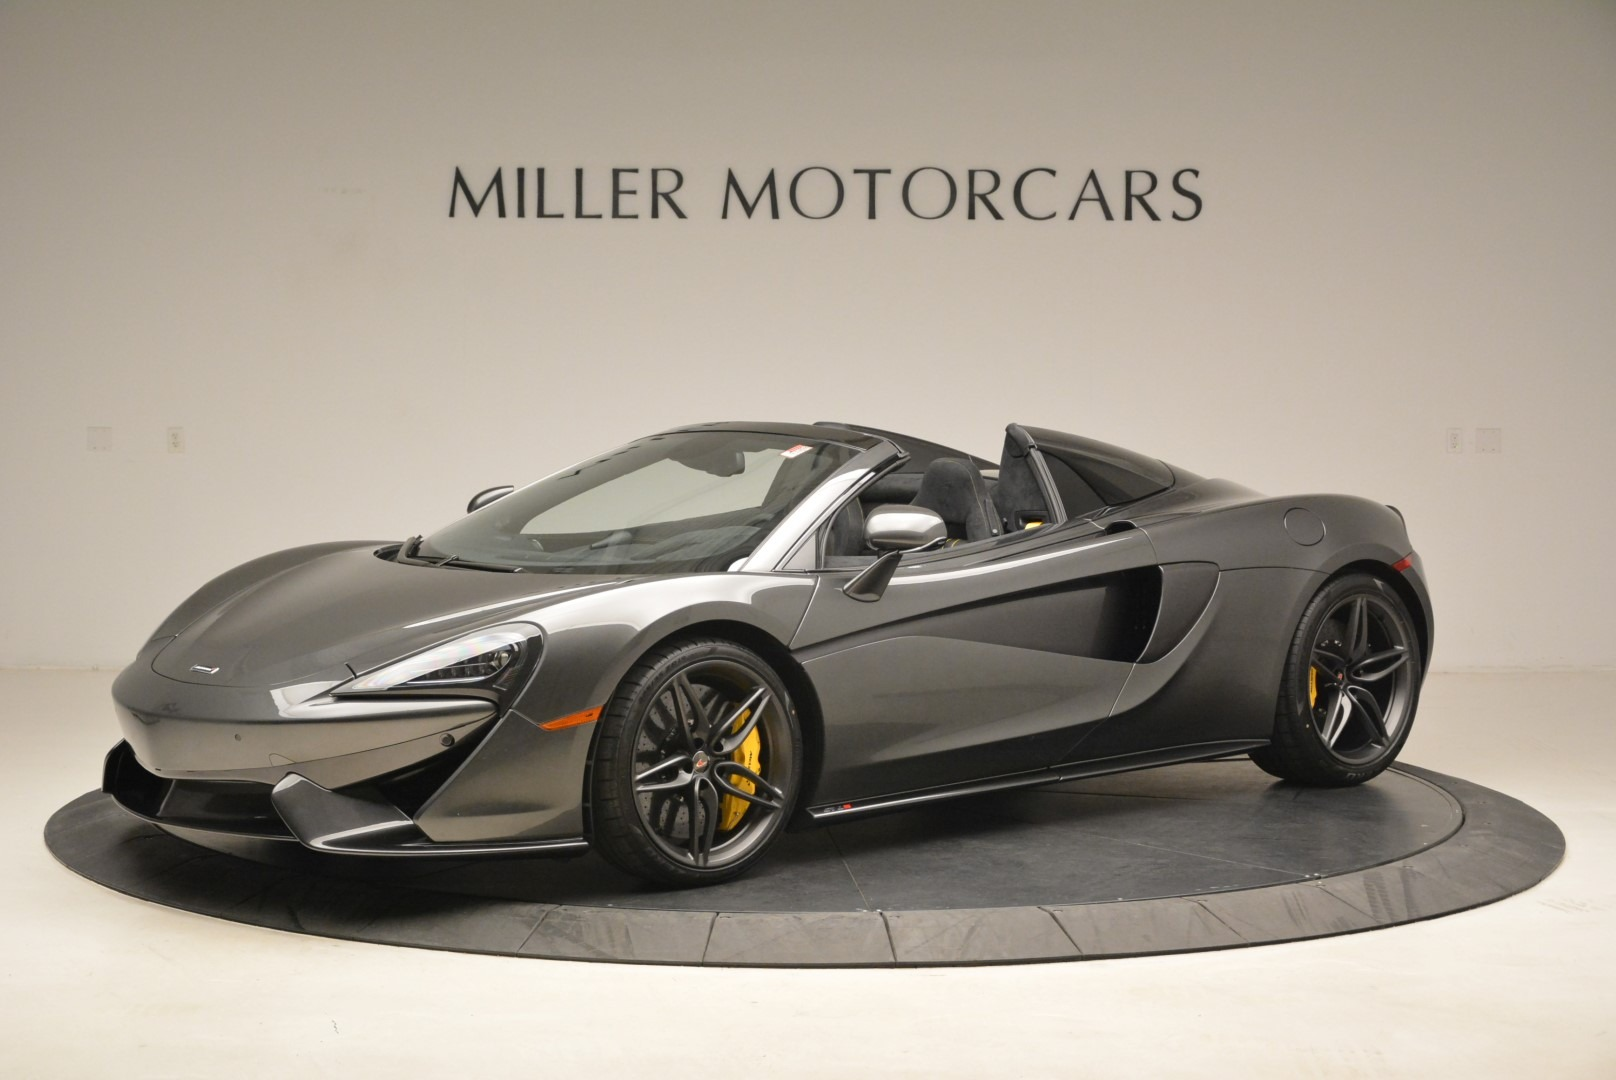 New 2018 McLaren 570S Spider For Sale In Greenwich, CT 2137_p2